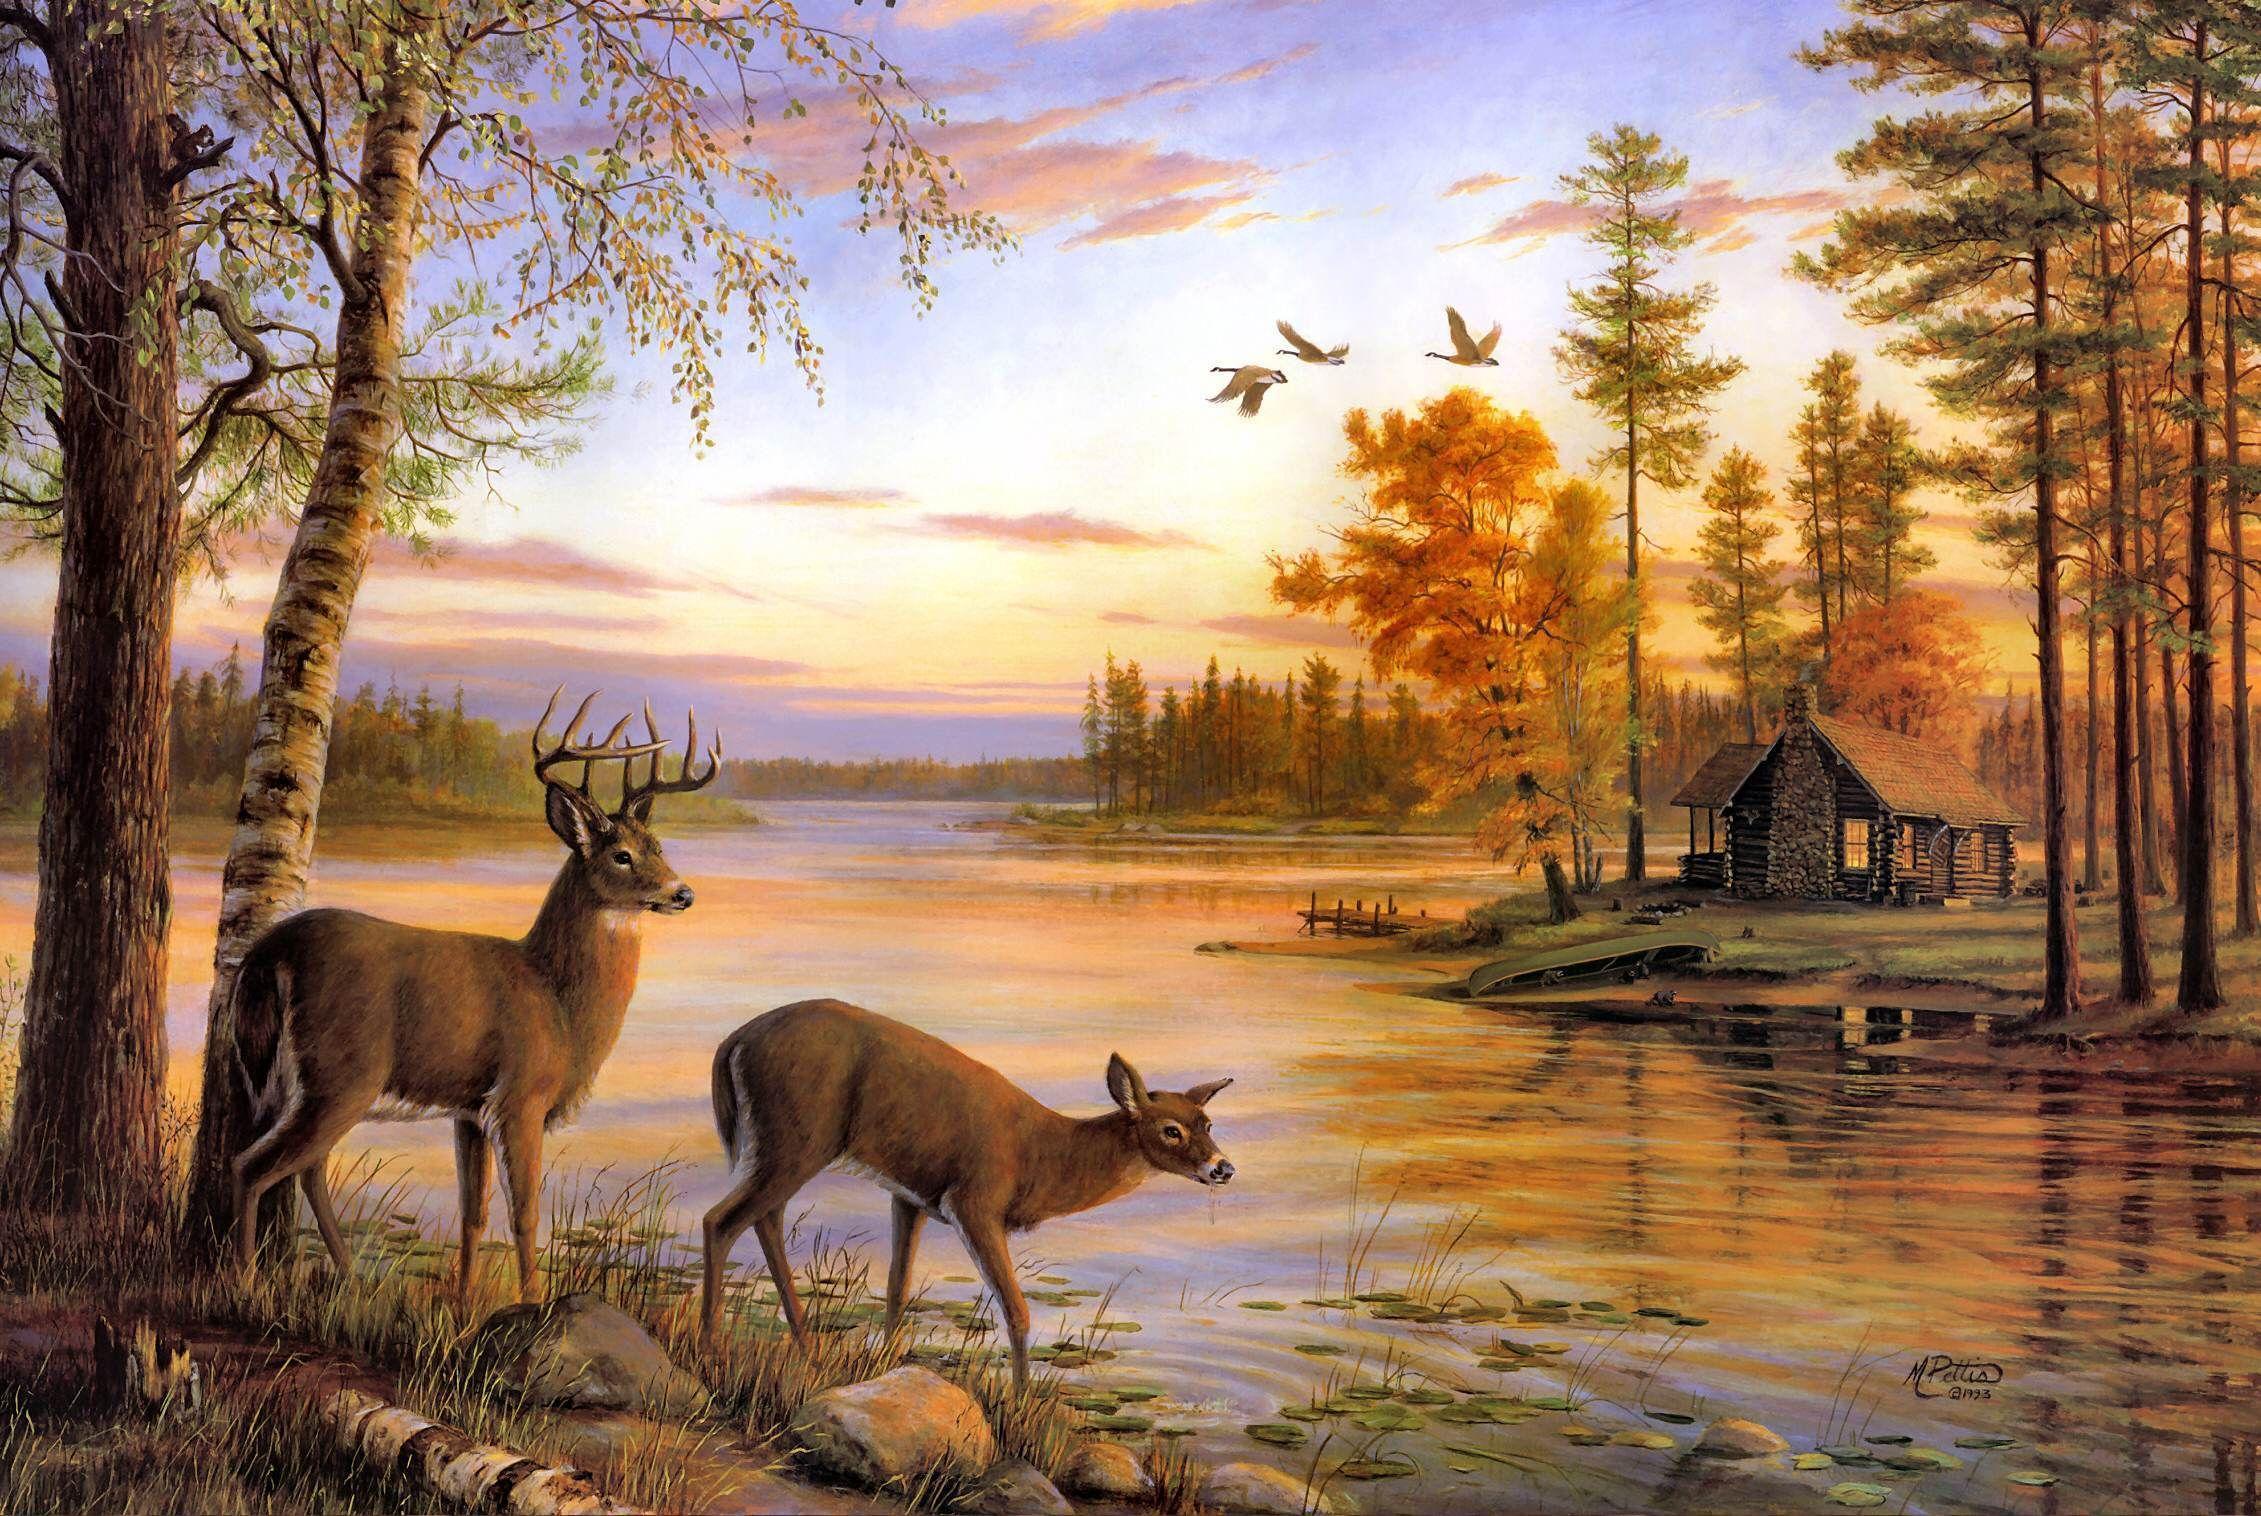 Download New Deer Wallpaper Wym In 2020 Deer Painting Deer Wallpaper Deer Art